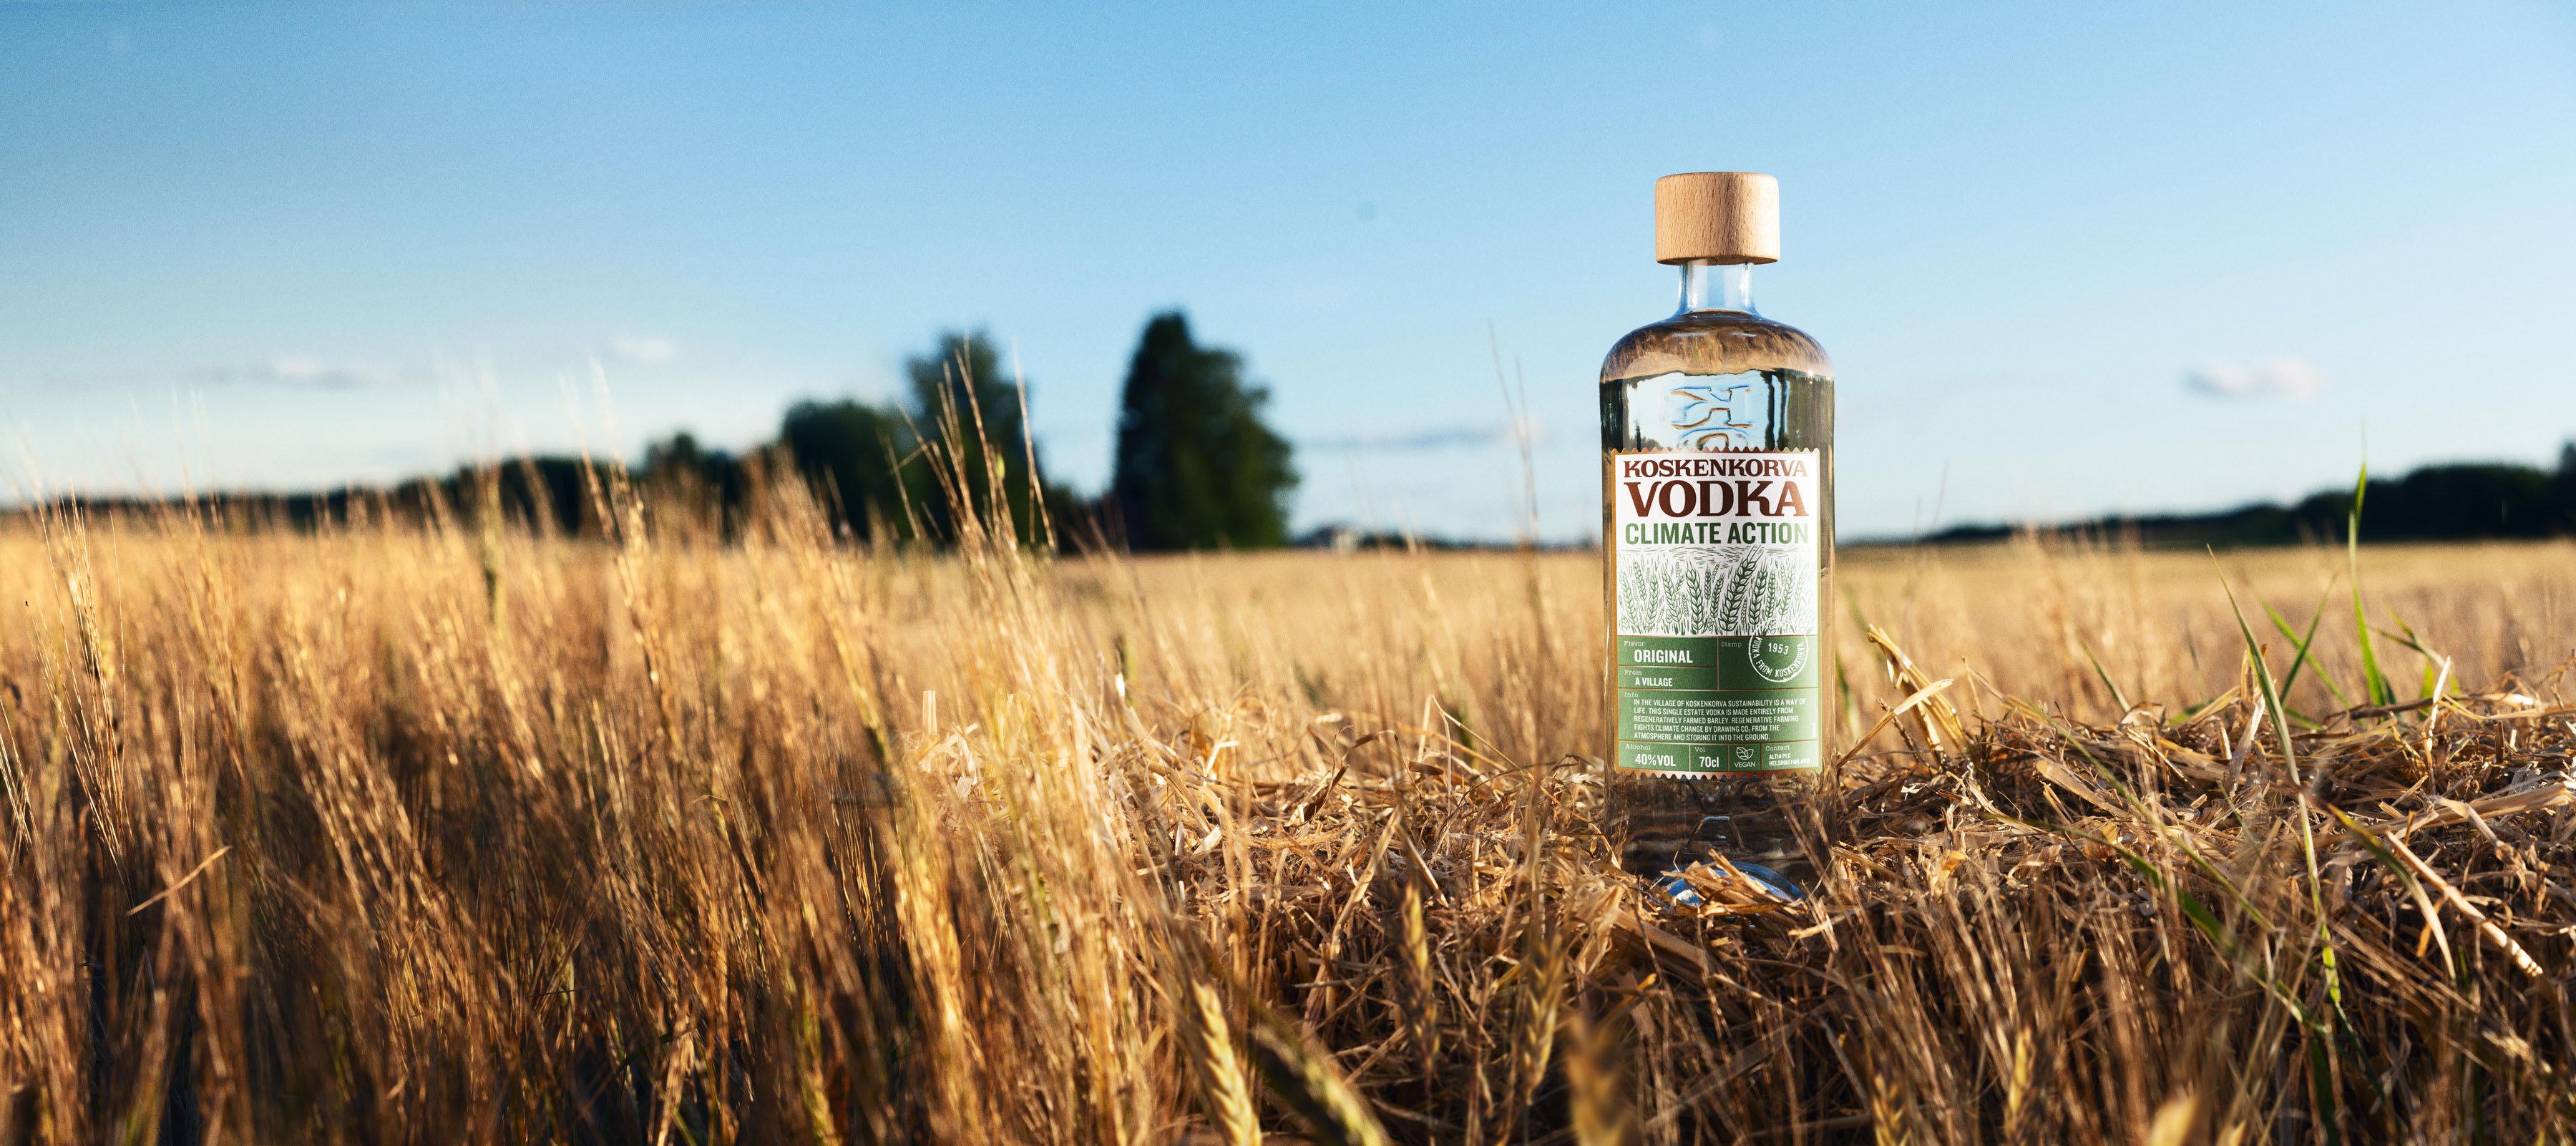 Koskenkorva Vodka Climate Action Bottle on a field